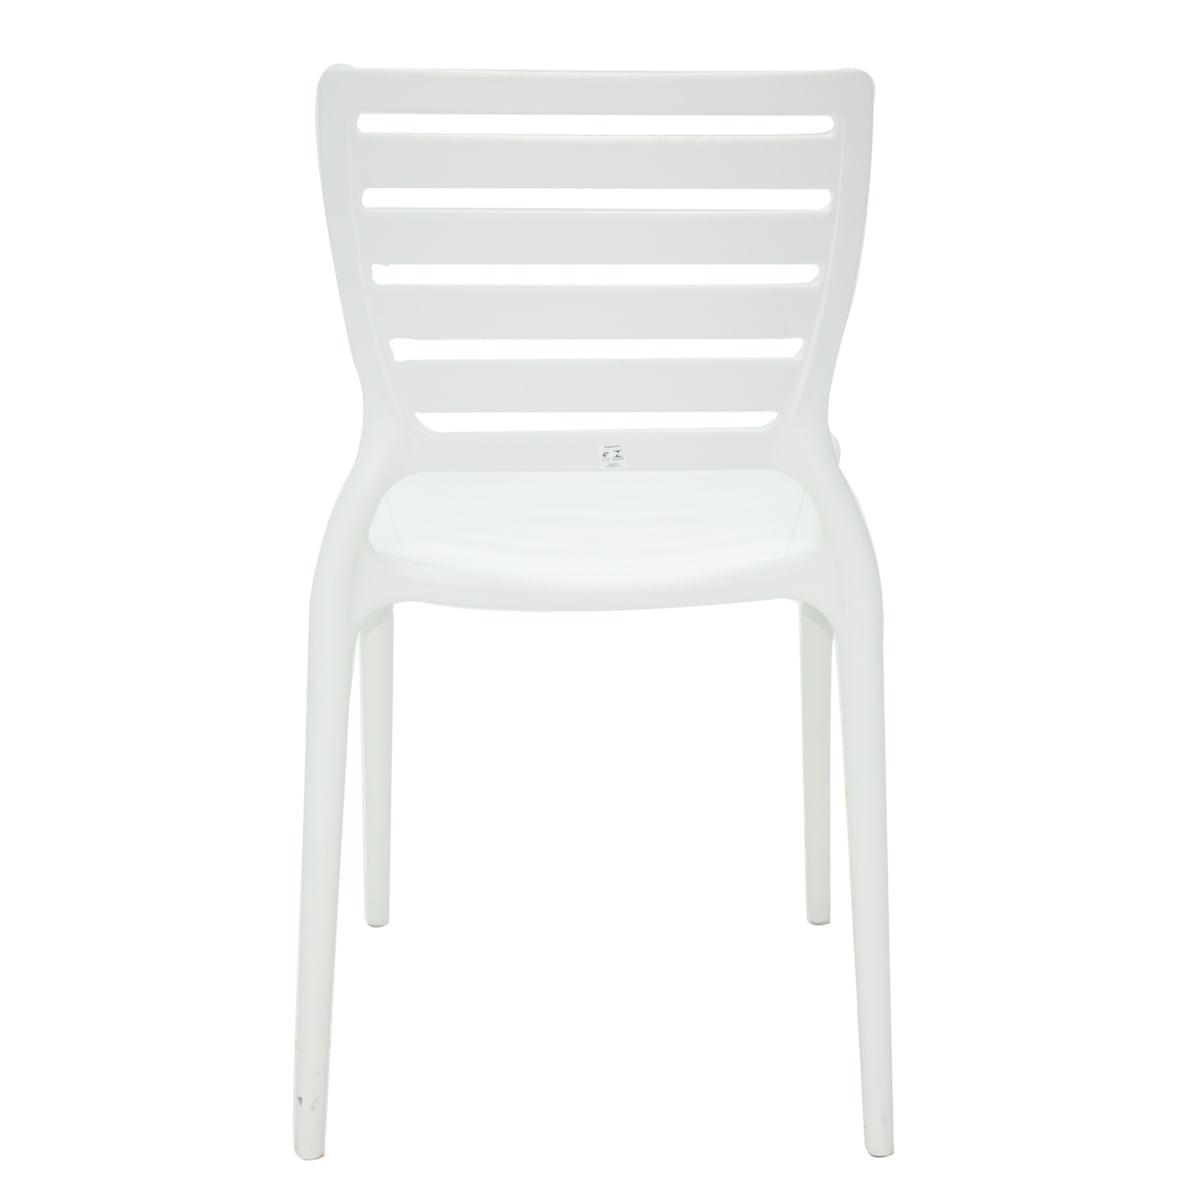 Cadeira Sofia encosto horizontal branca Tramontina 92237010